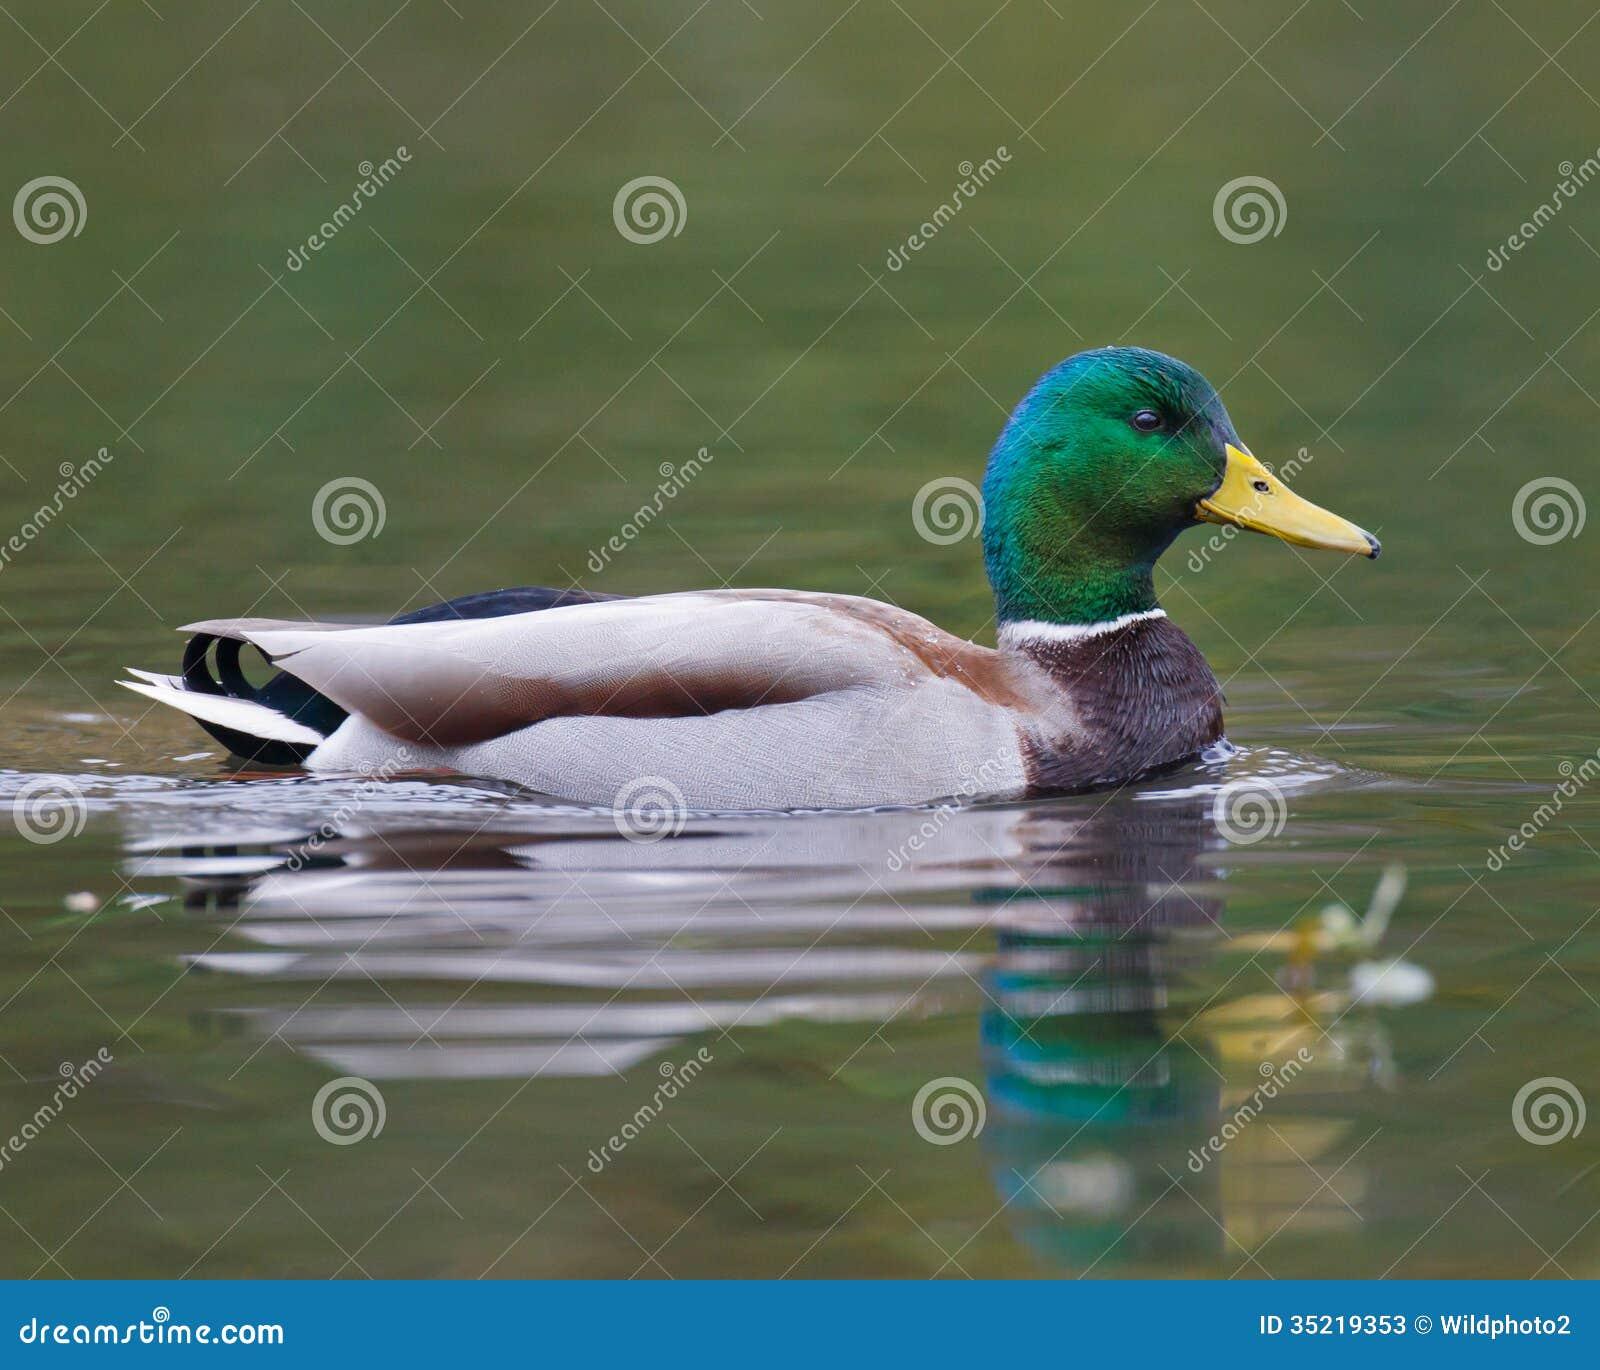 Swimming Mallard Duck Stock Photos - Image: 35219353